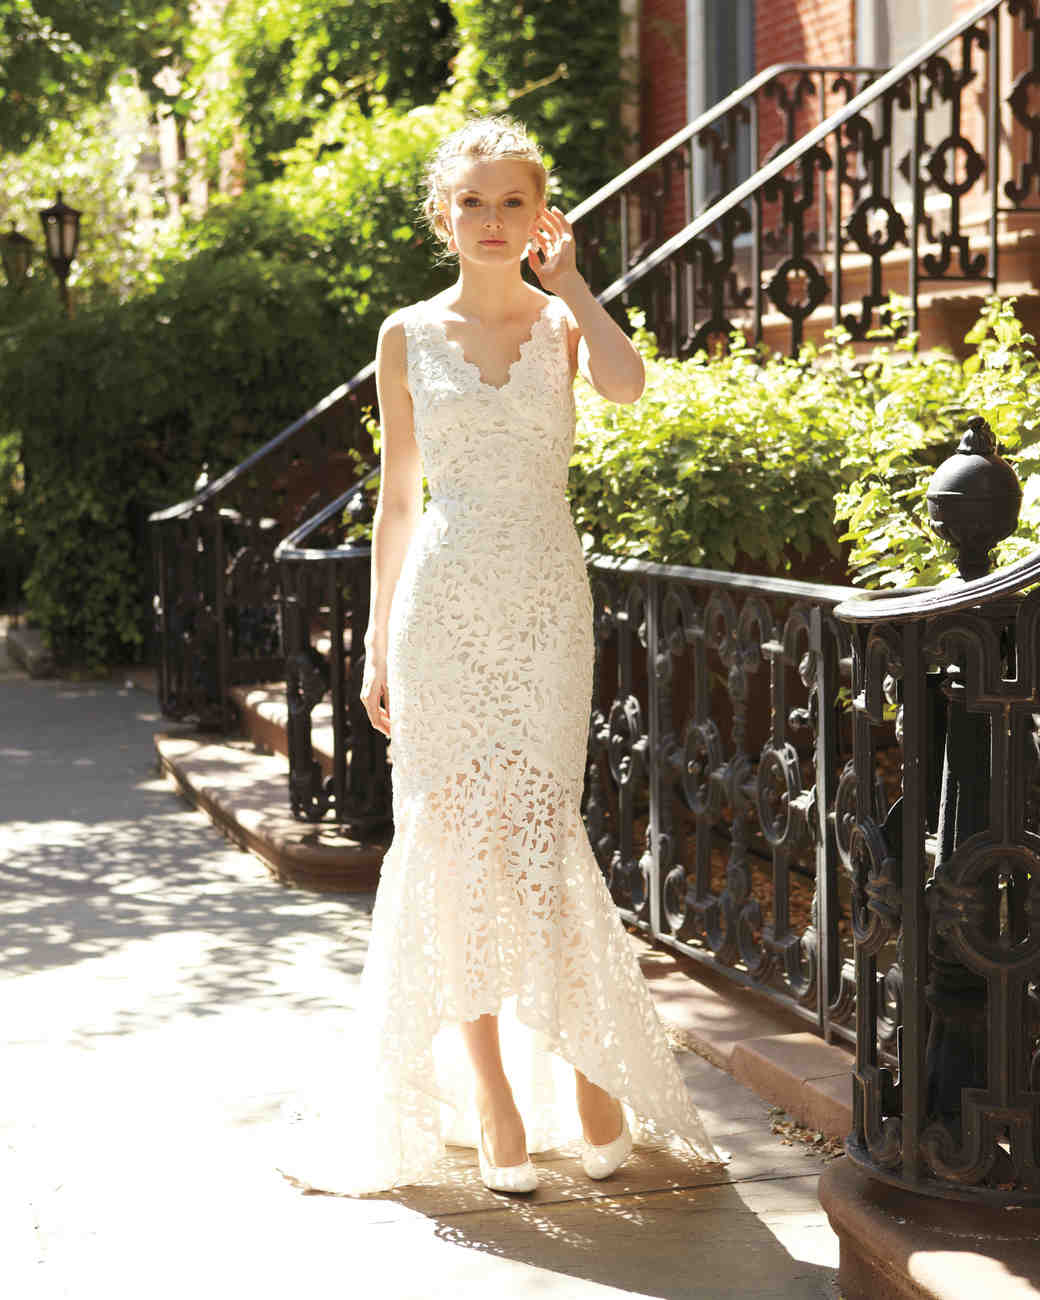 bergdorf goodman wedding dresses » Wedding Dresses Designs, Ideas ...